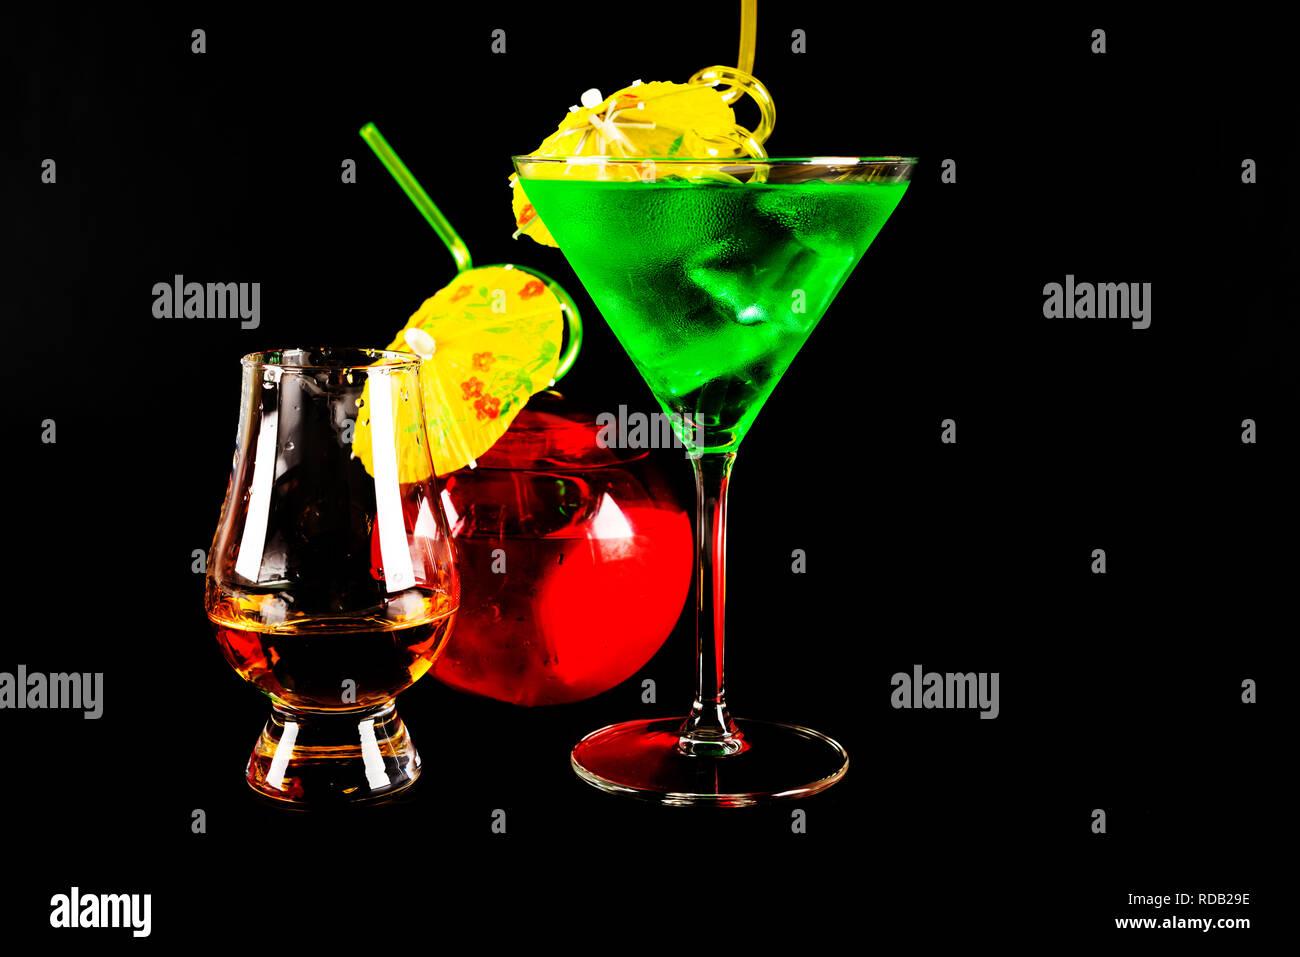 liqueurs et sirops